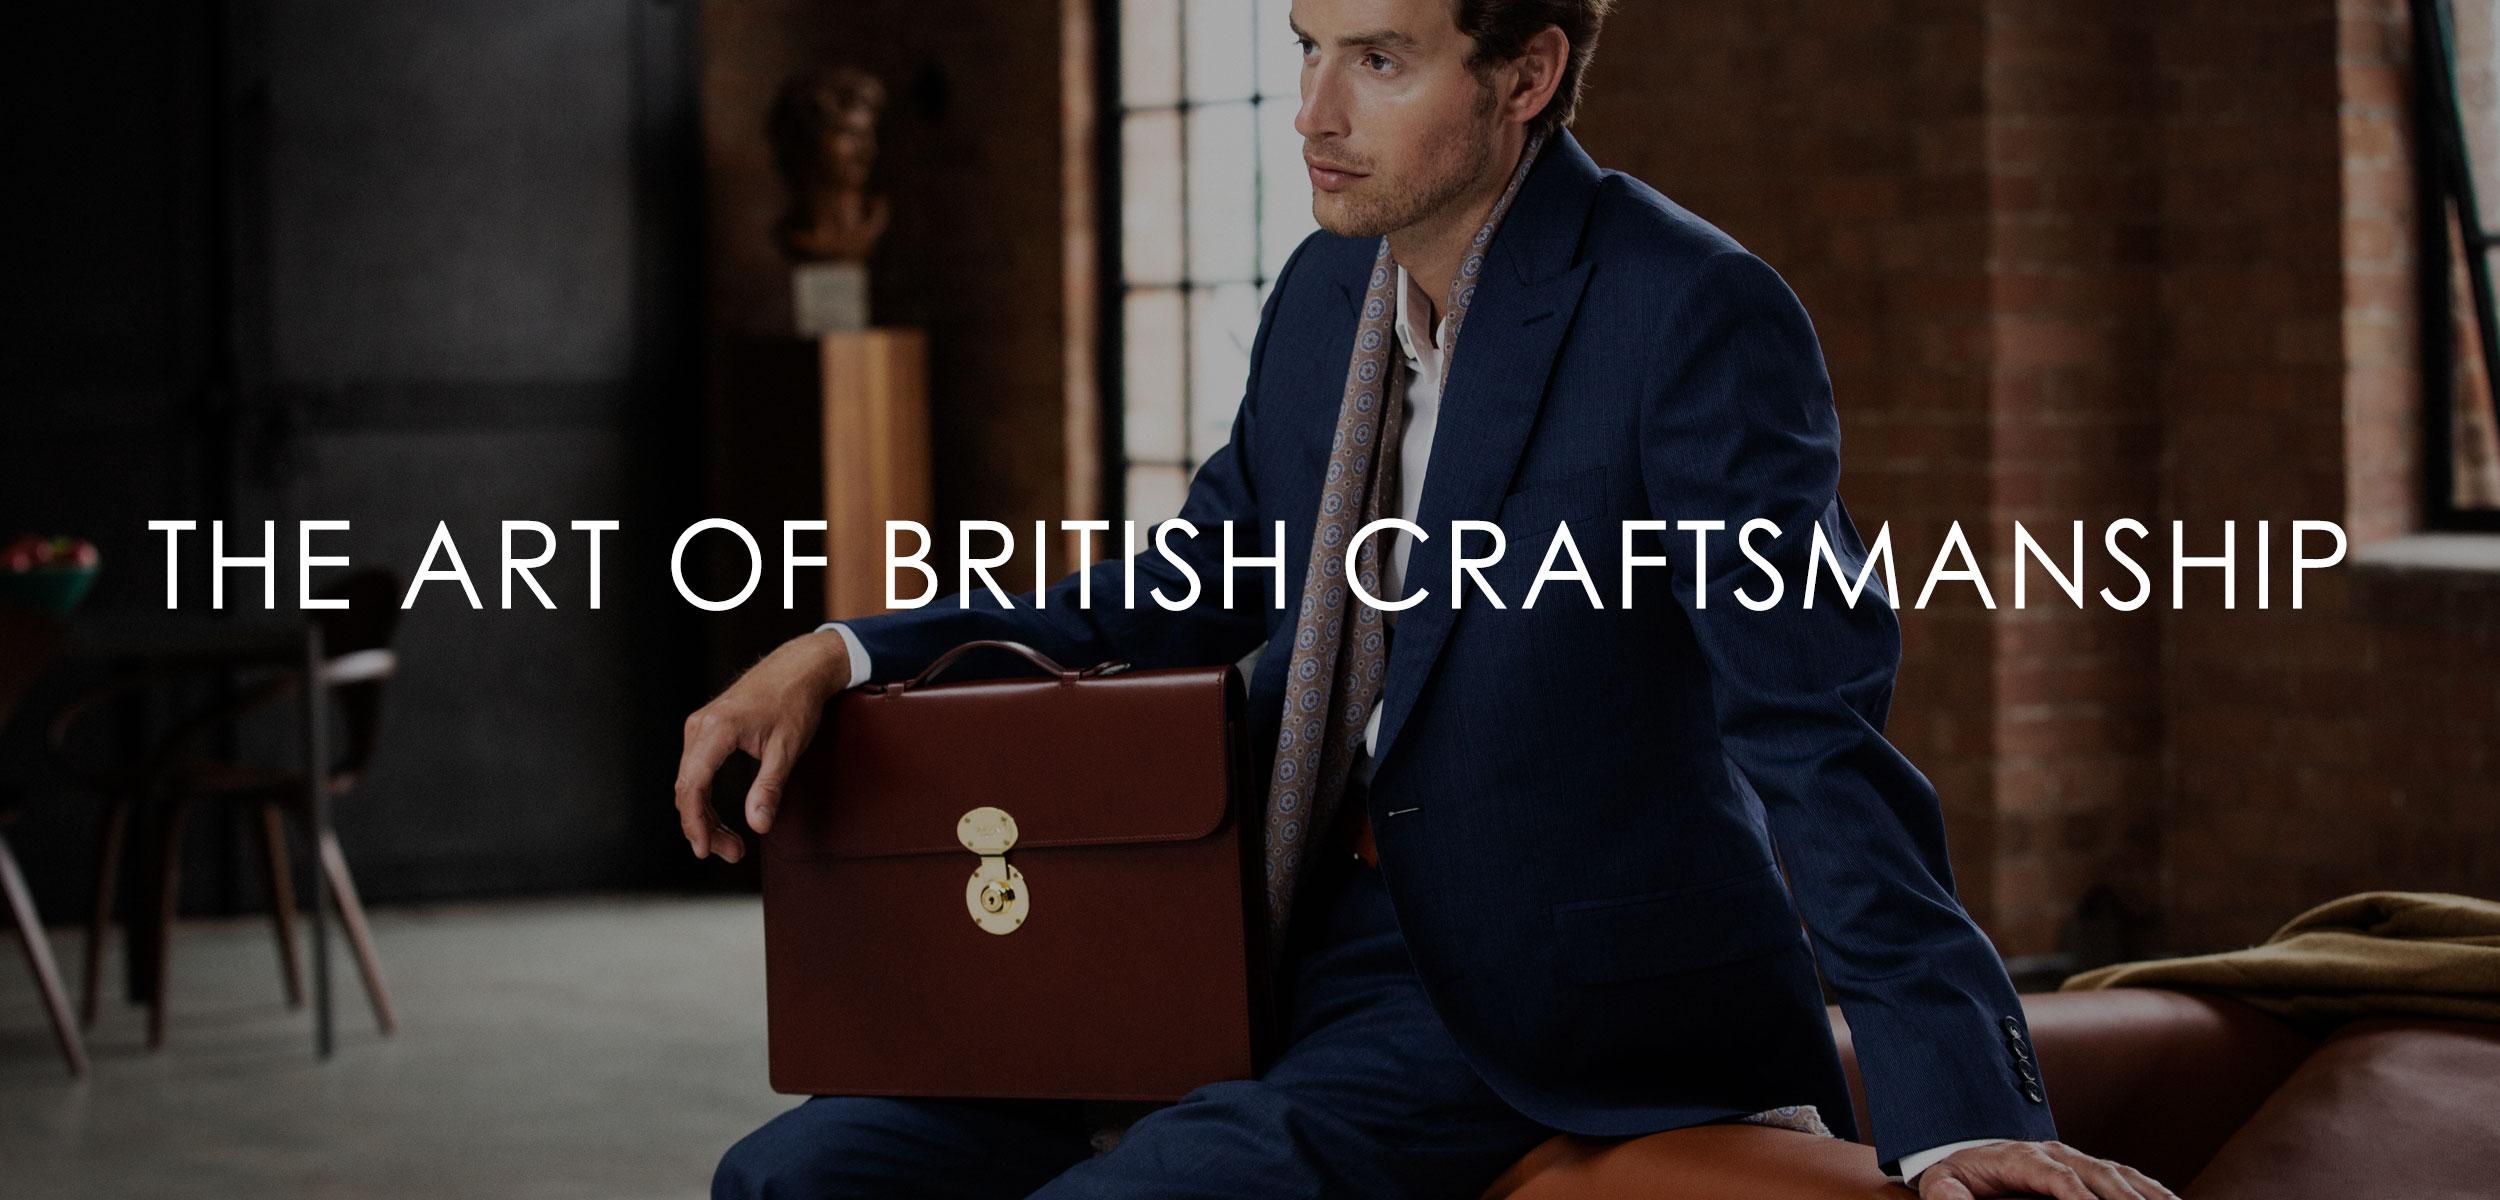 Simpson-Slide-1-Art-of-British-Crafrsmanship.jpg